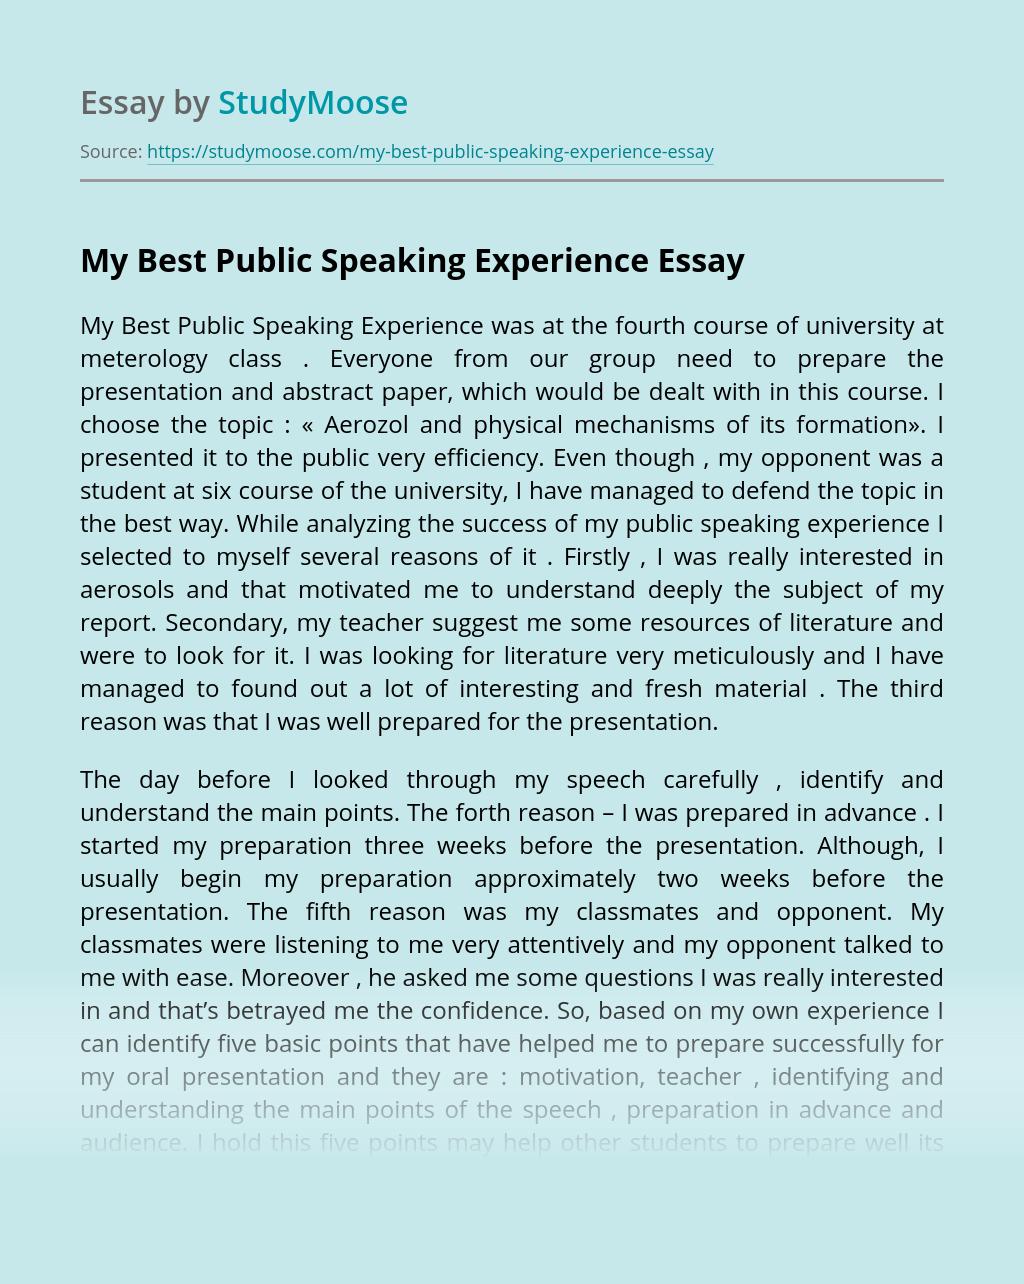 My Best Public Speaking Experience